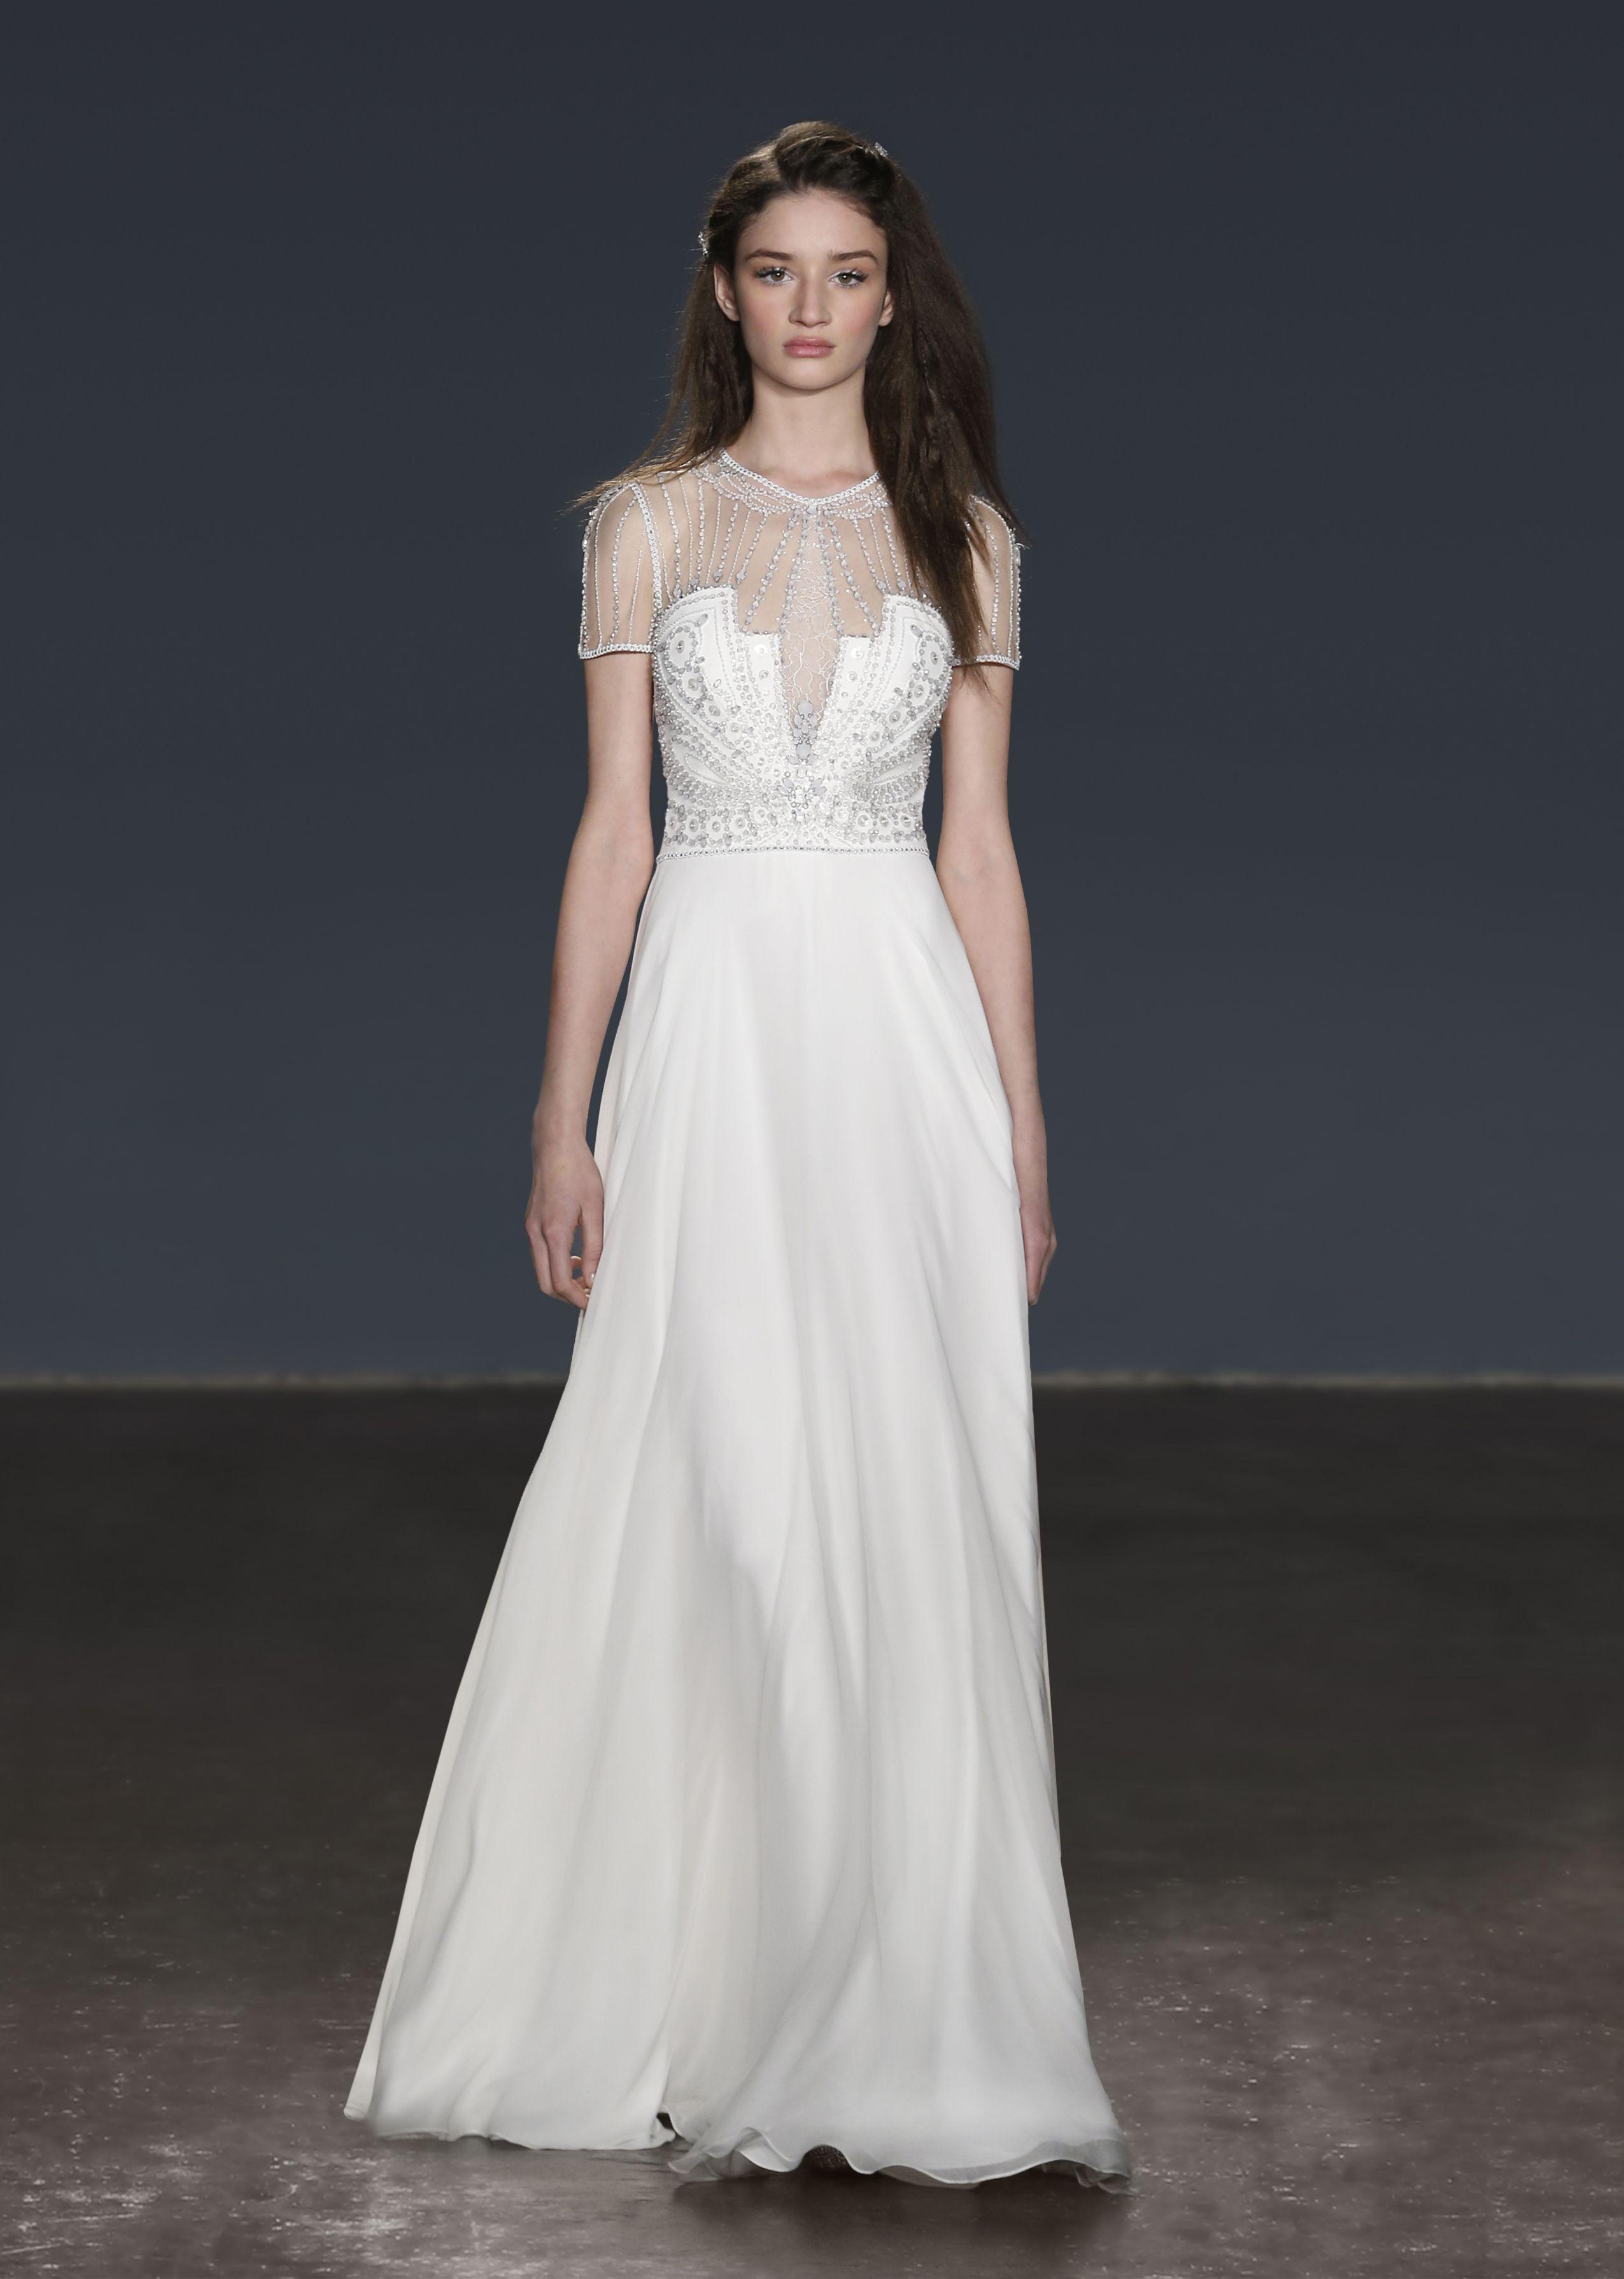 2018 Bridal Jenny Packham Destiny Wedding dresses